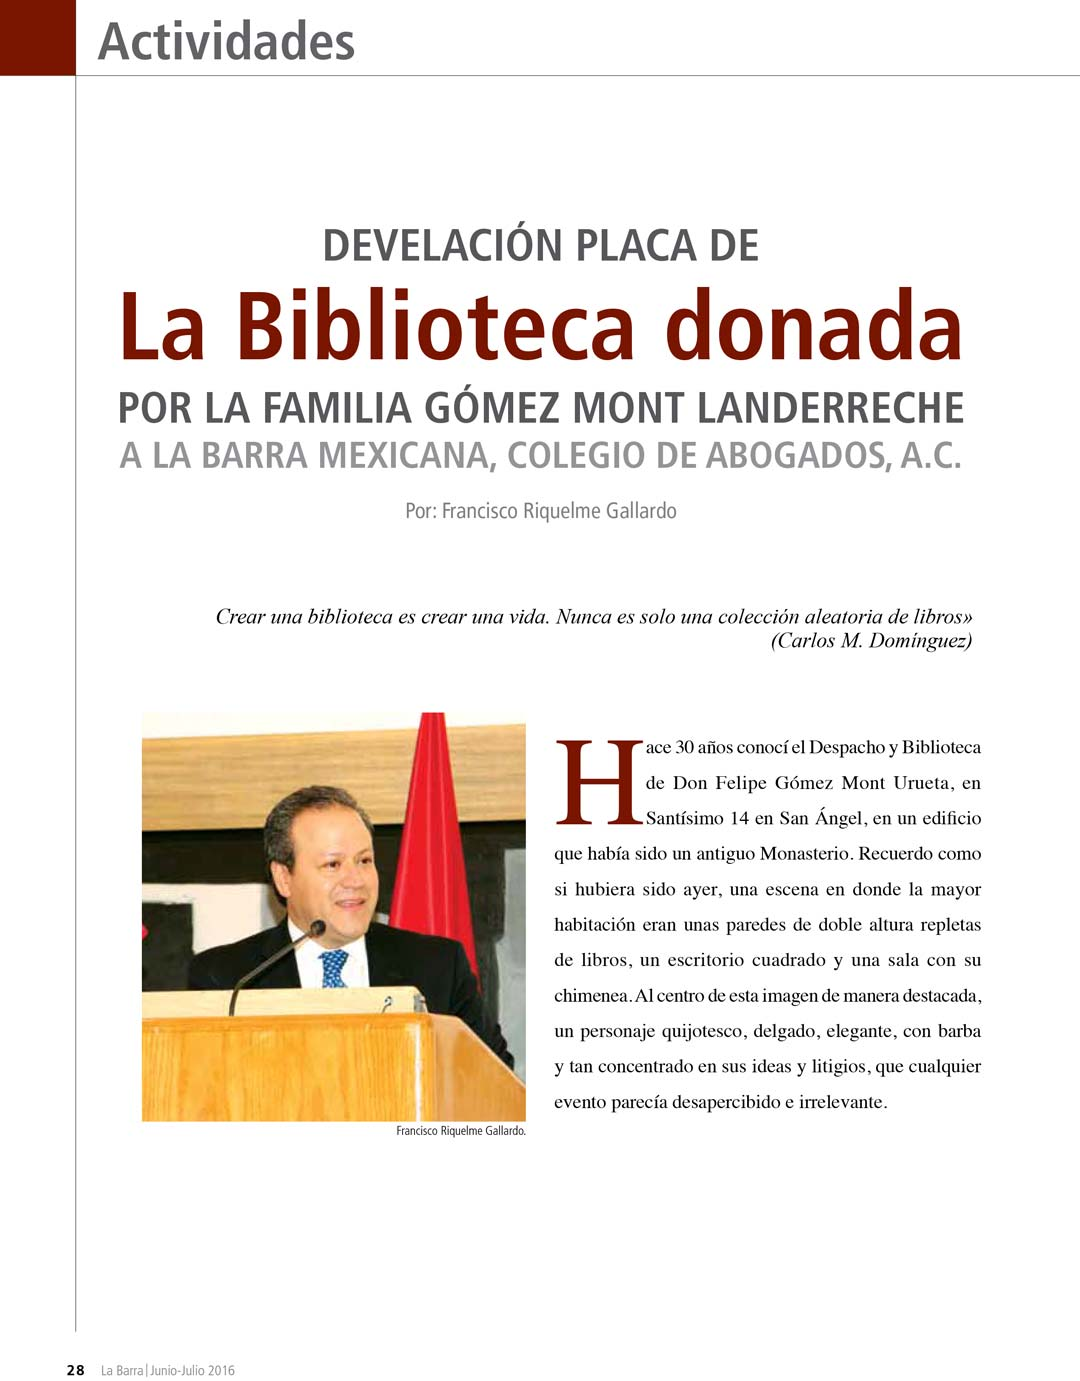 Donación de biblioteca Gómez Mont a Barra de Abogados